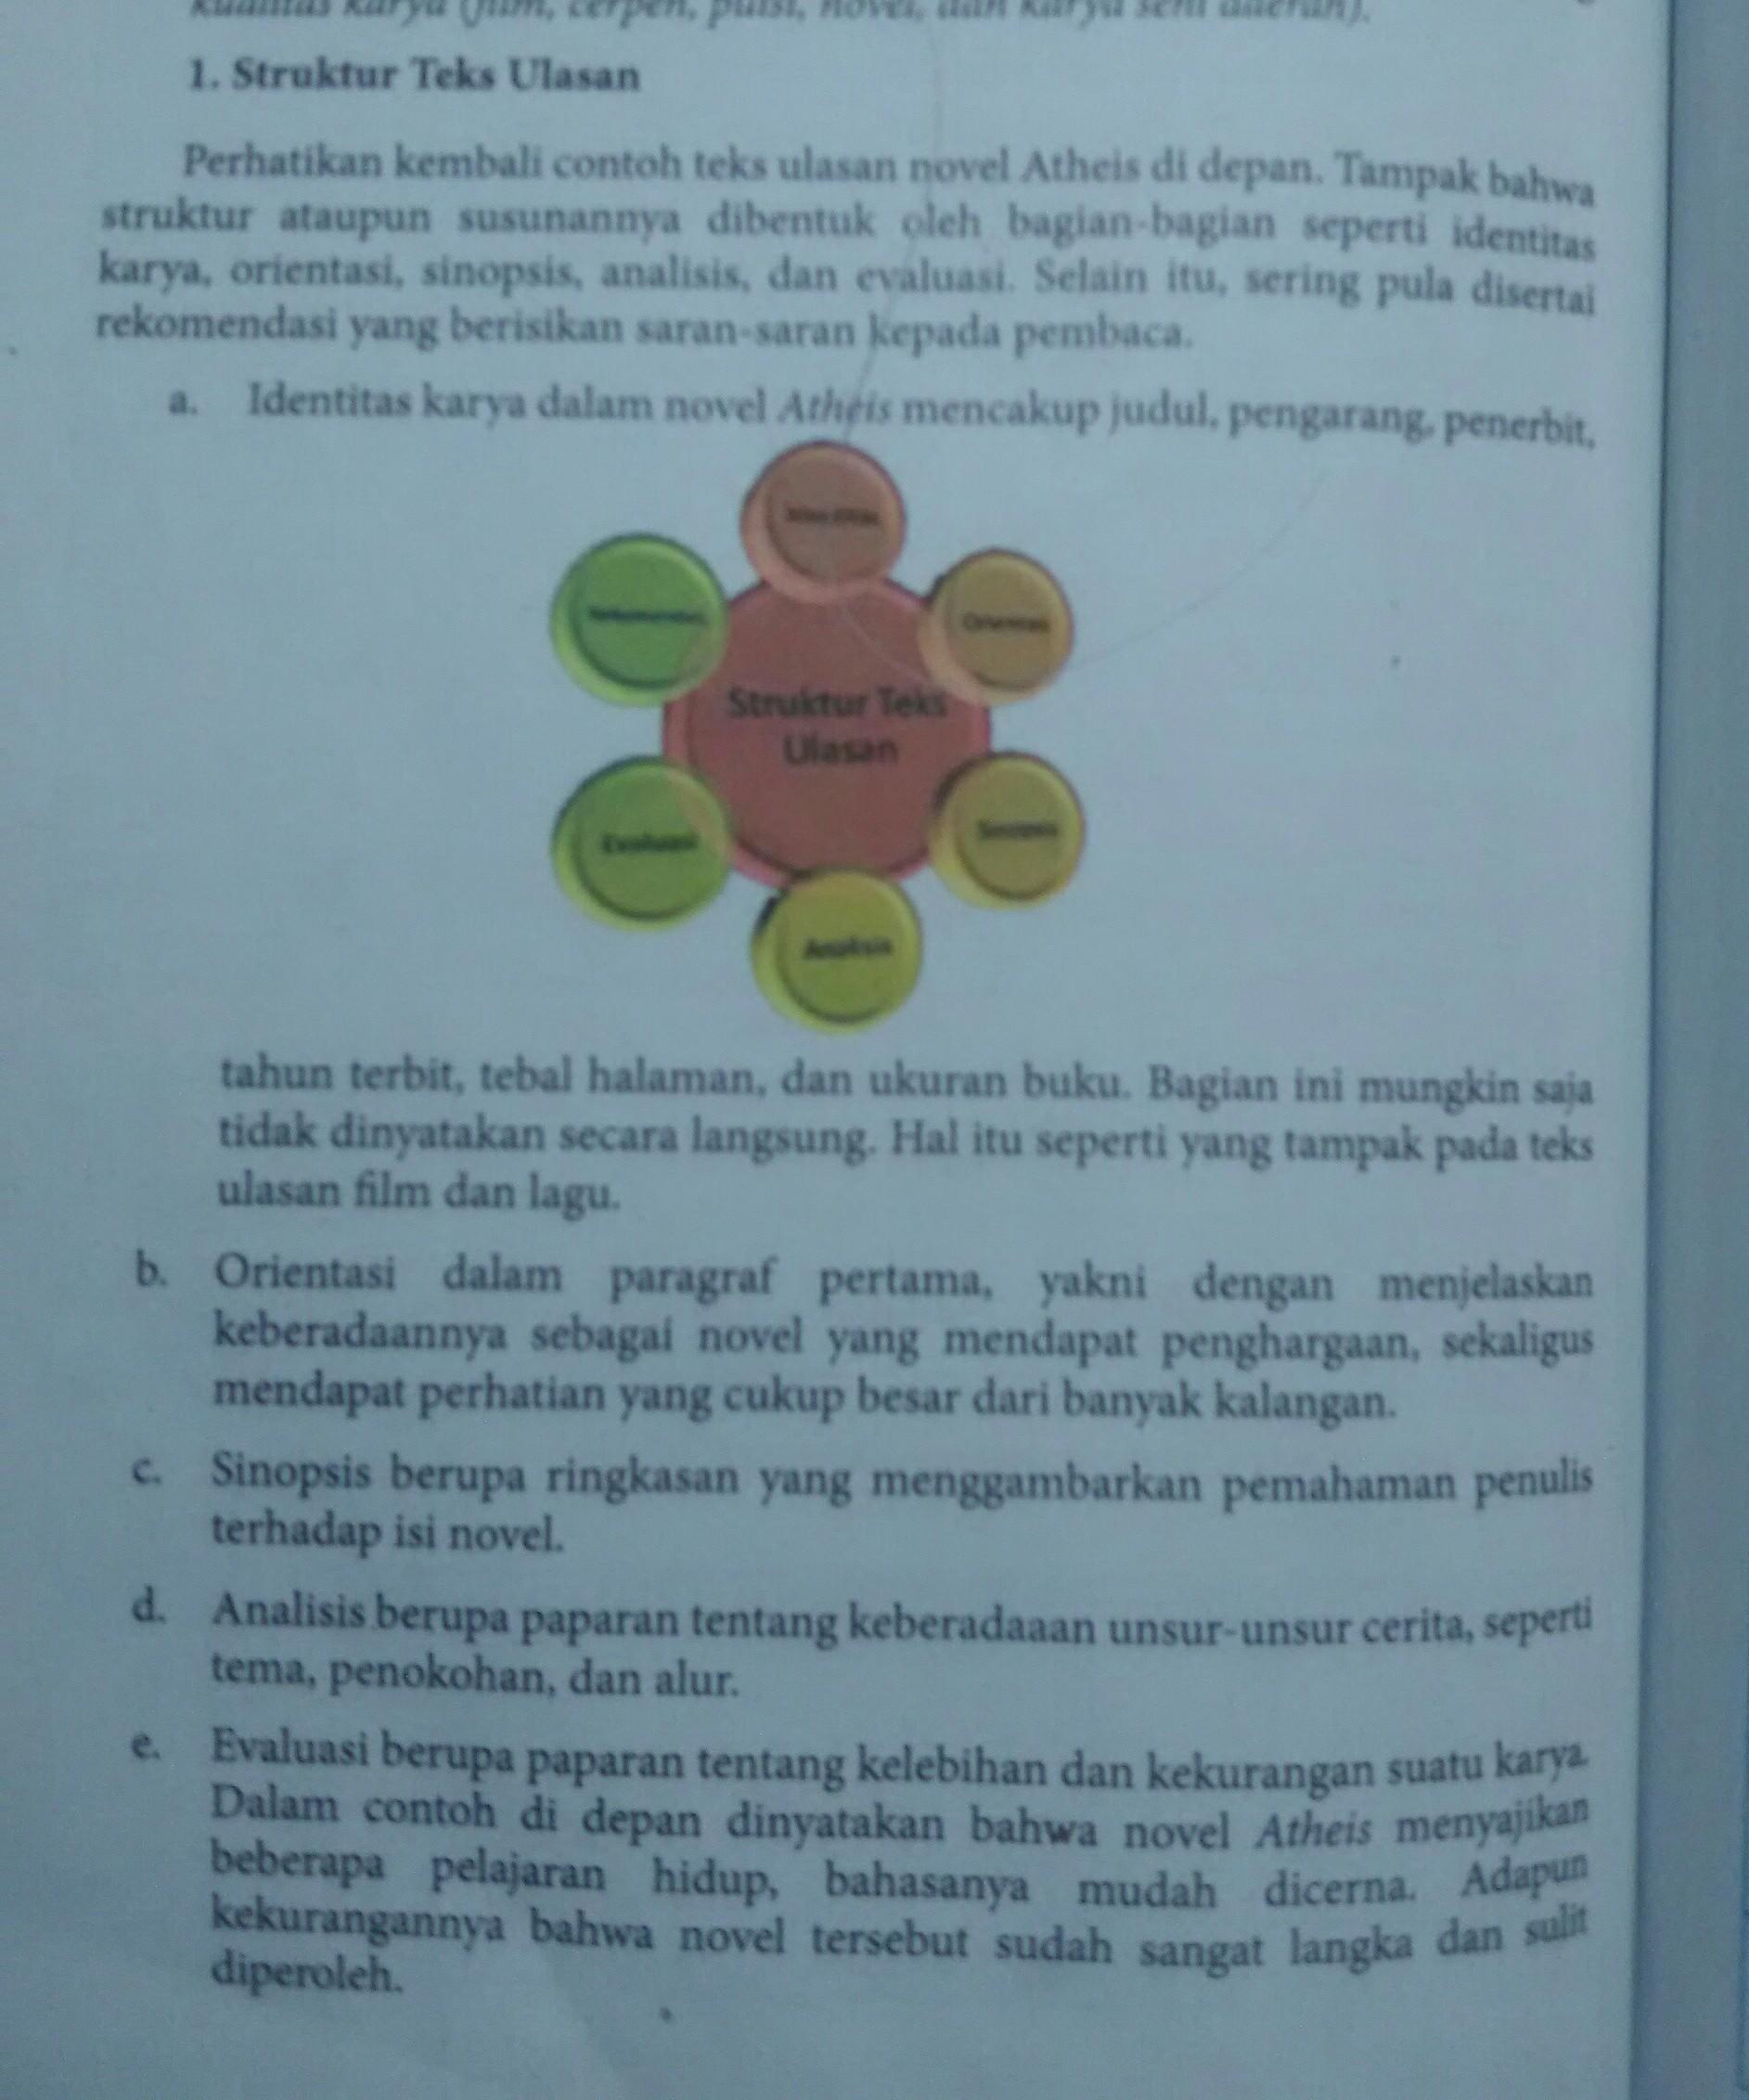 Sebutkan Dan Jelaskan Struktur Teks Anekdot : sebutkan, jelaskan, struktur, anekdot, Sebutkan, Jelaskan, Struktur, Anekdot, Berbagai